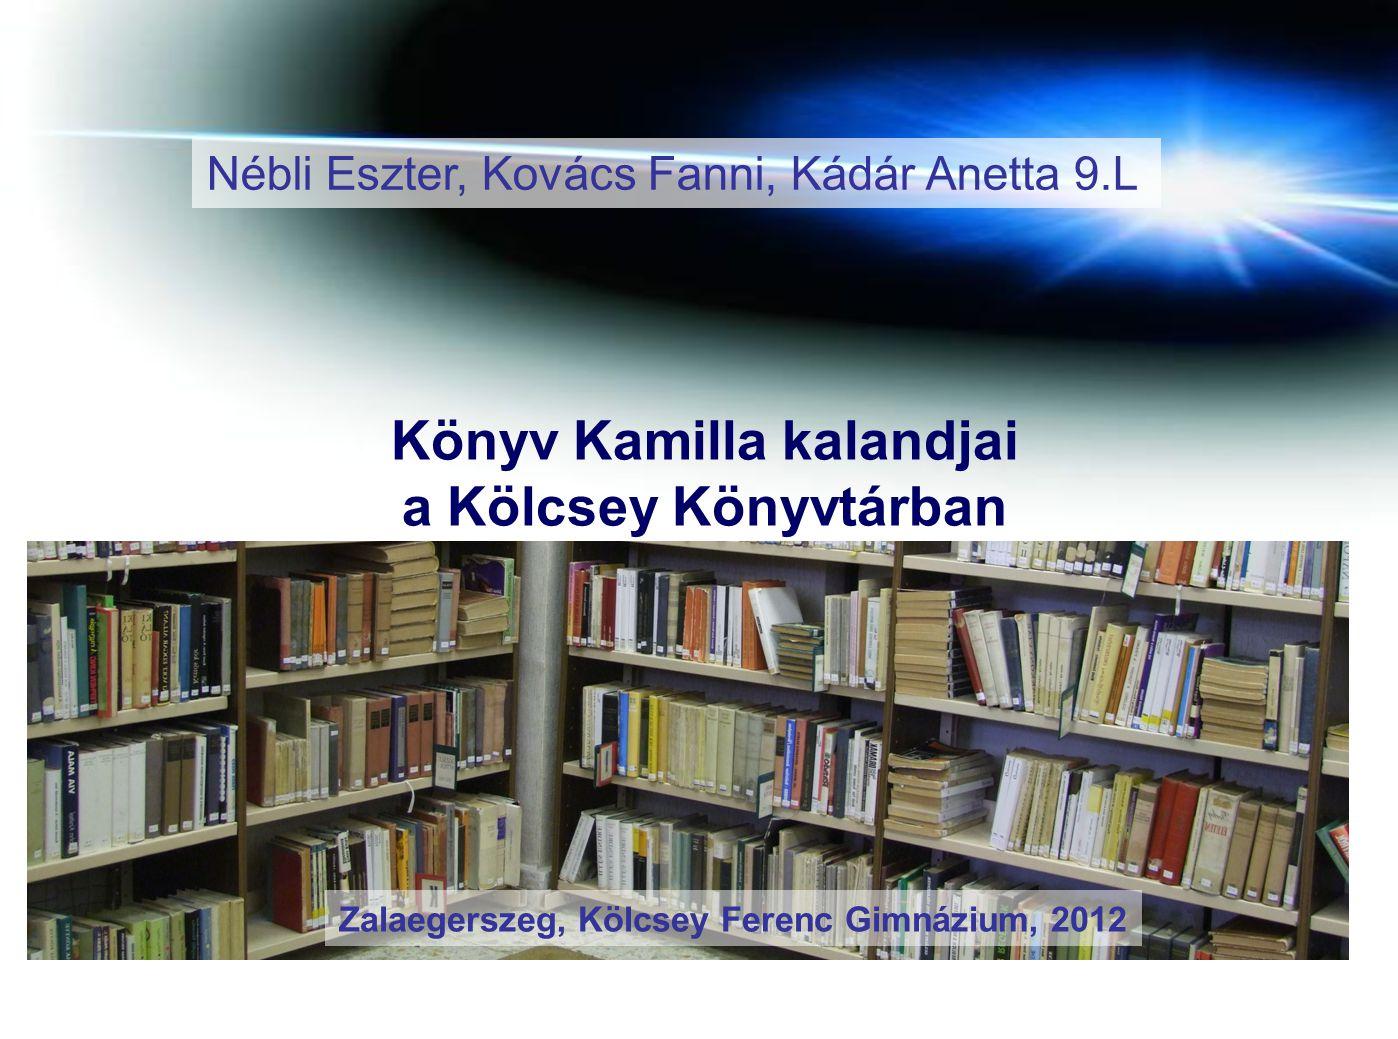 Könyv Kamilla kalandjai